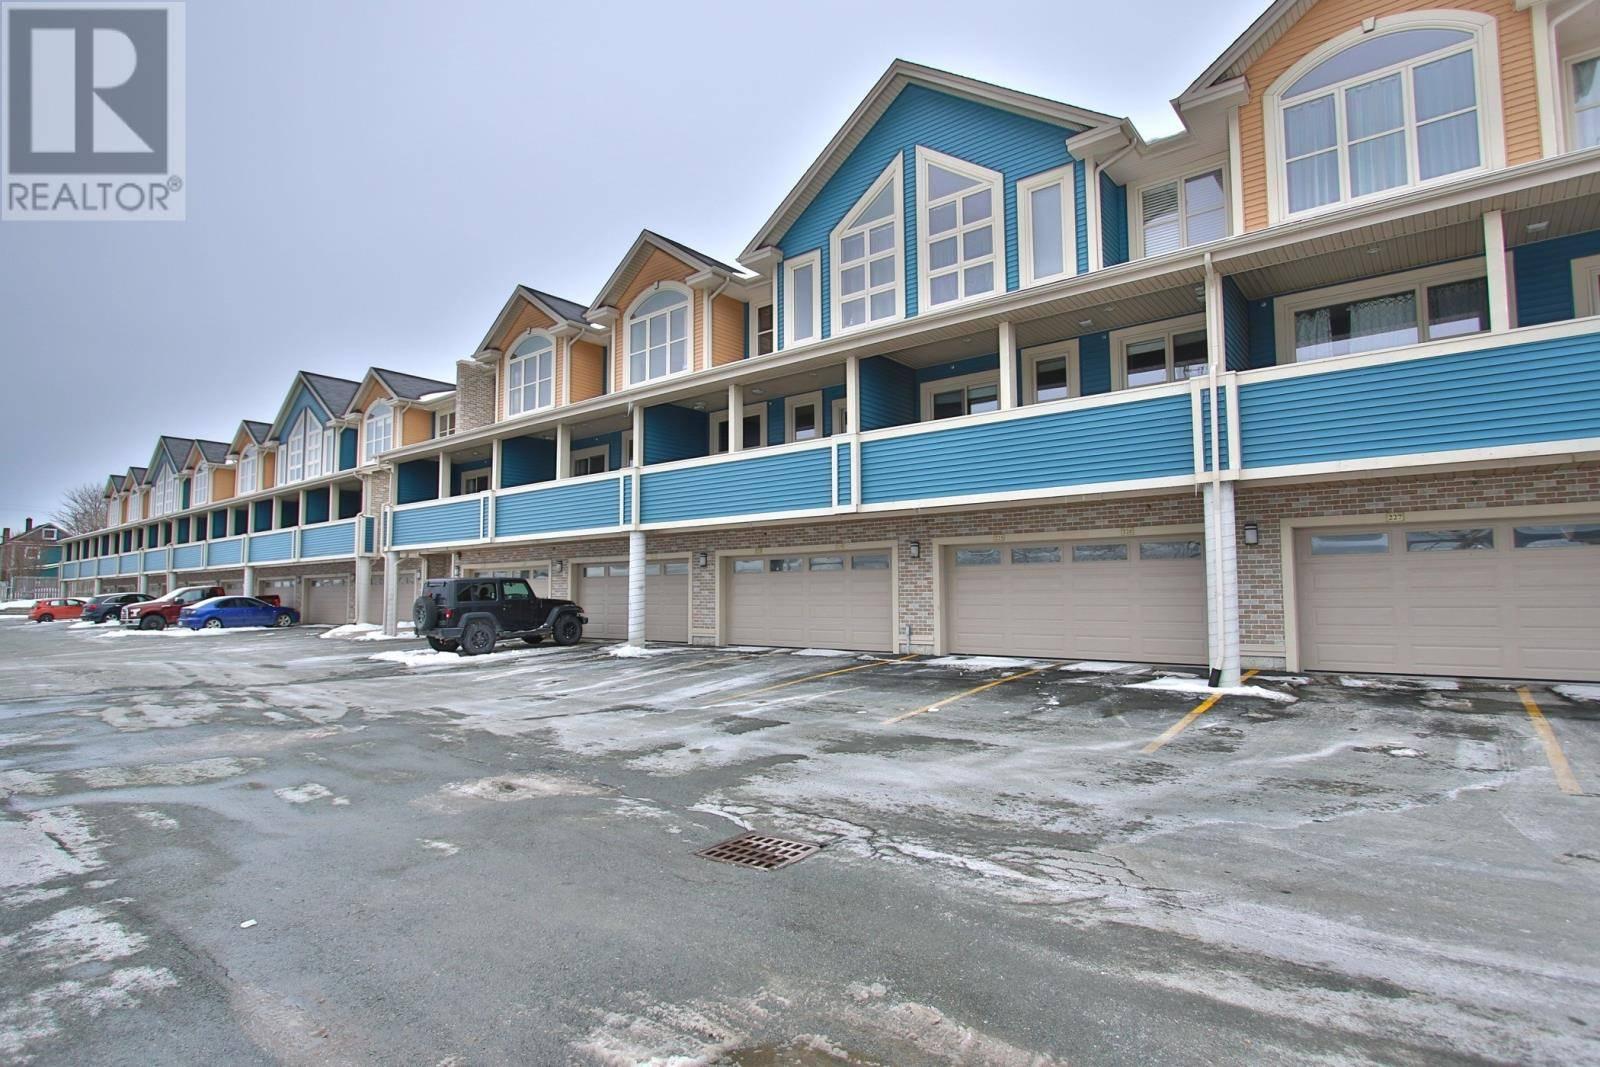 House for sale at 10 Suvla St Unit 108 St. John's Newfoundland - MLS: 1209464